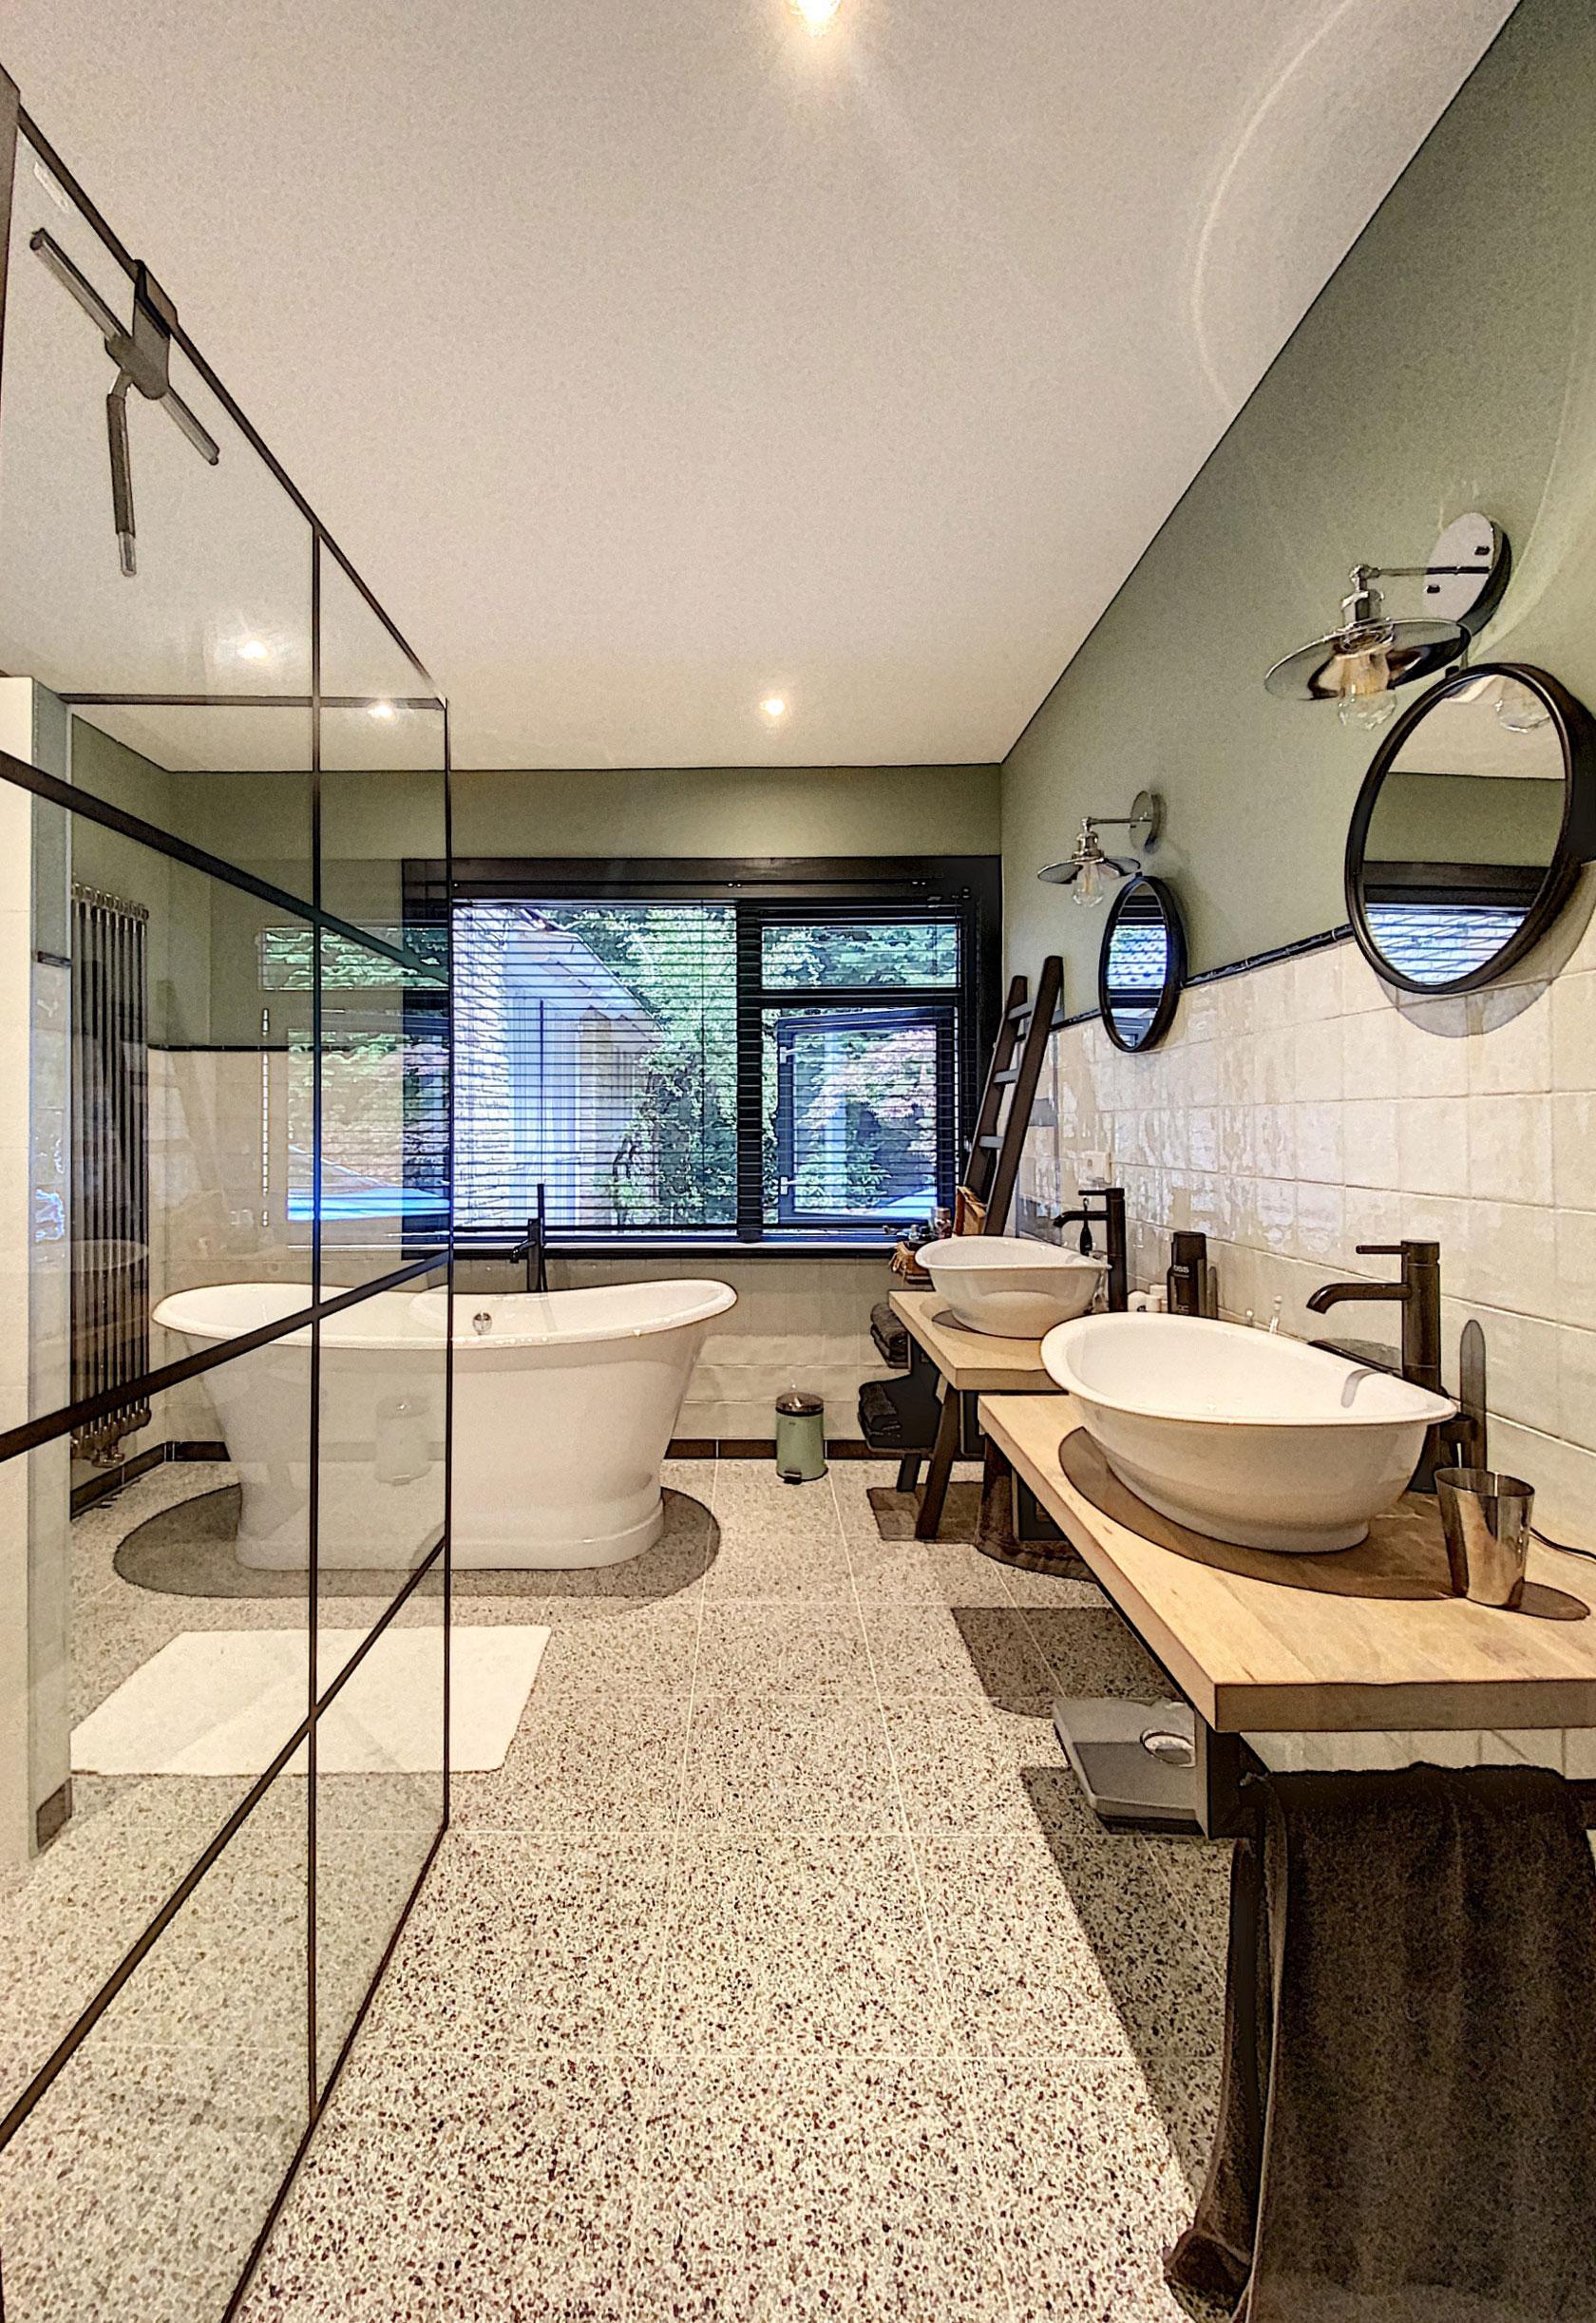 Verbouwing-woning-badkamer-10